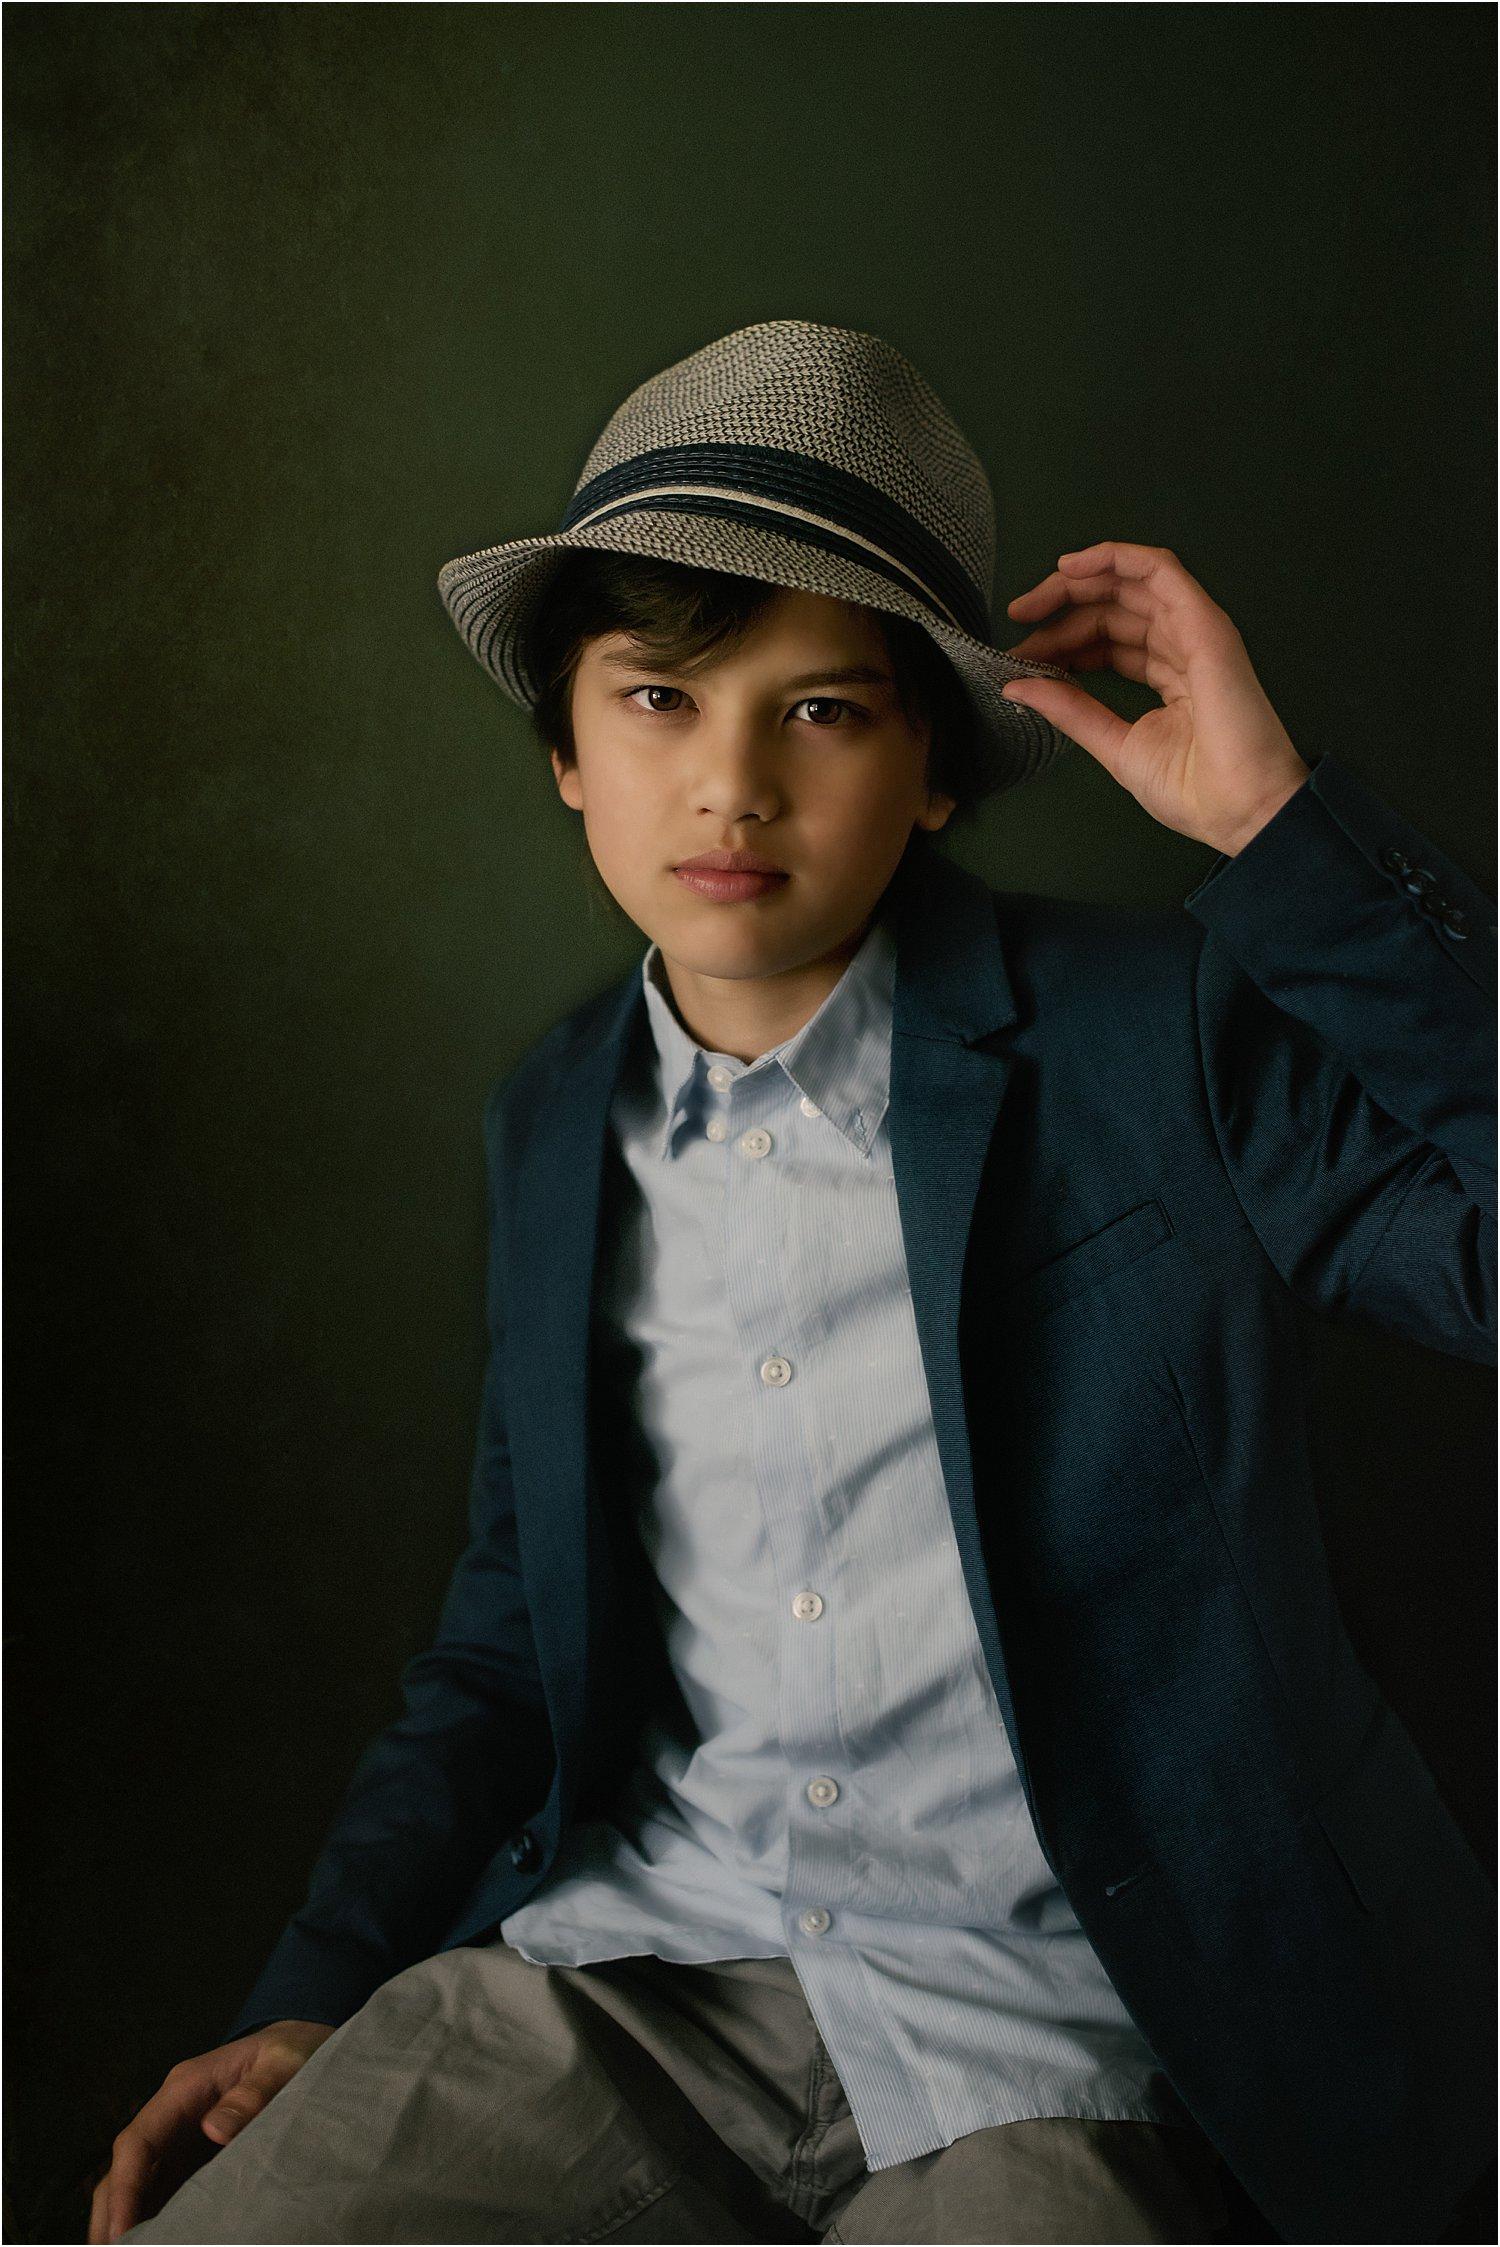 https://i2.wp.com/digital-photography-school.com/wp-content/uploads/2019/02/3-tips-moody-natural-portraits-dps-lily-sawyer-photo_0001.jpg?resize=1500%2C2247&ssl=1